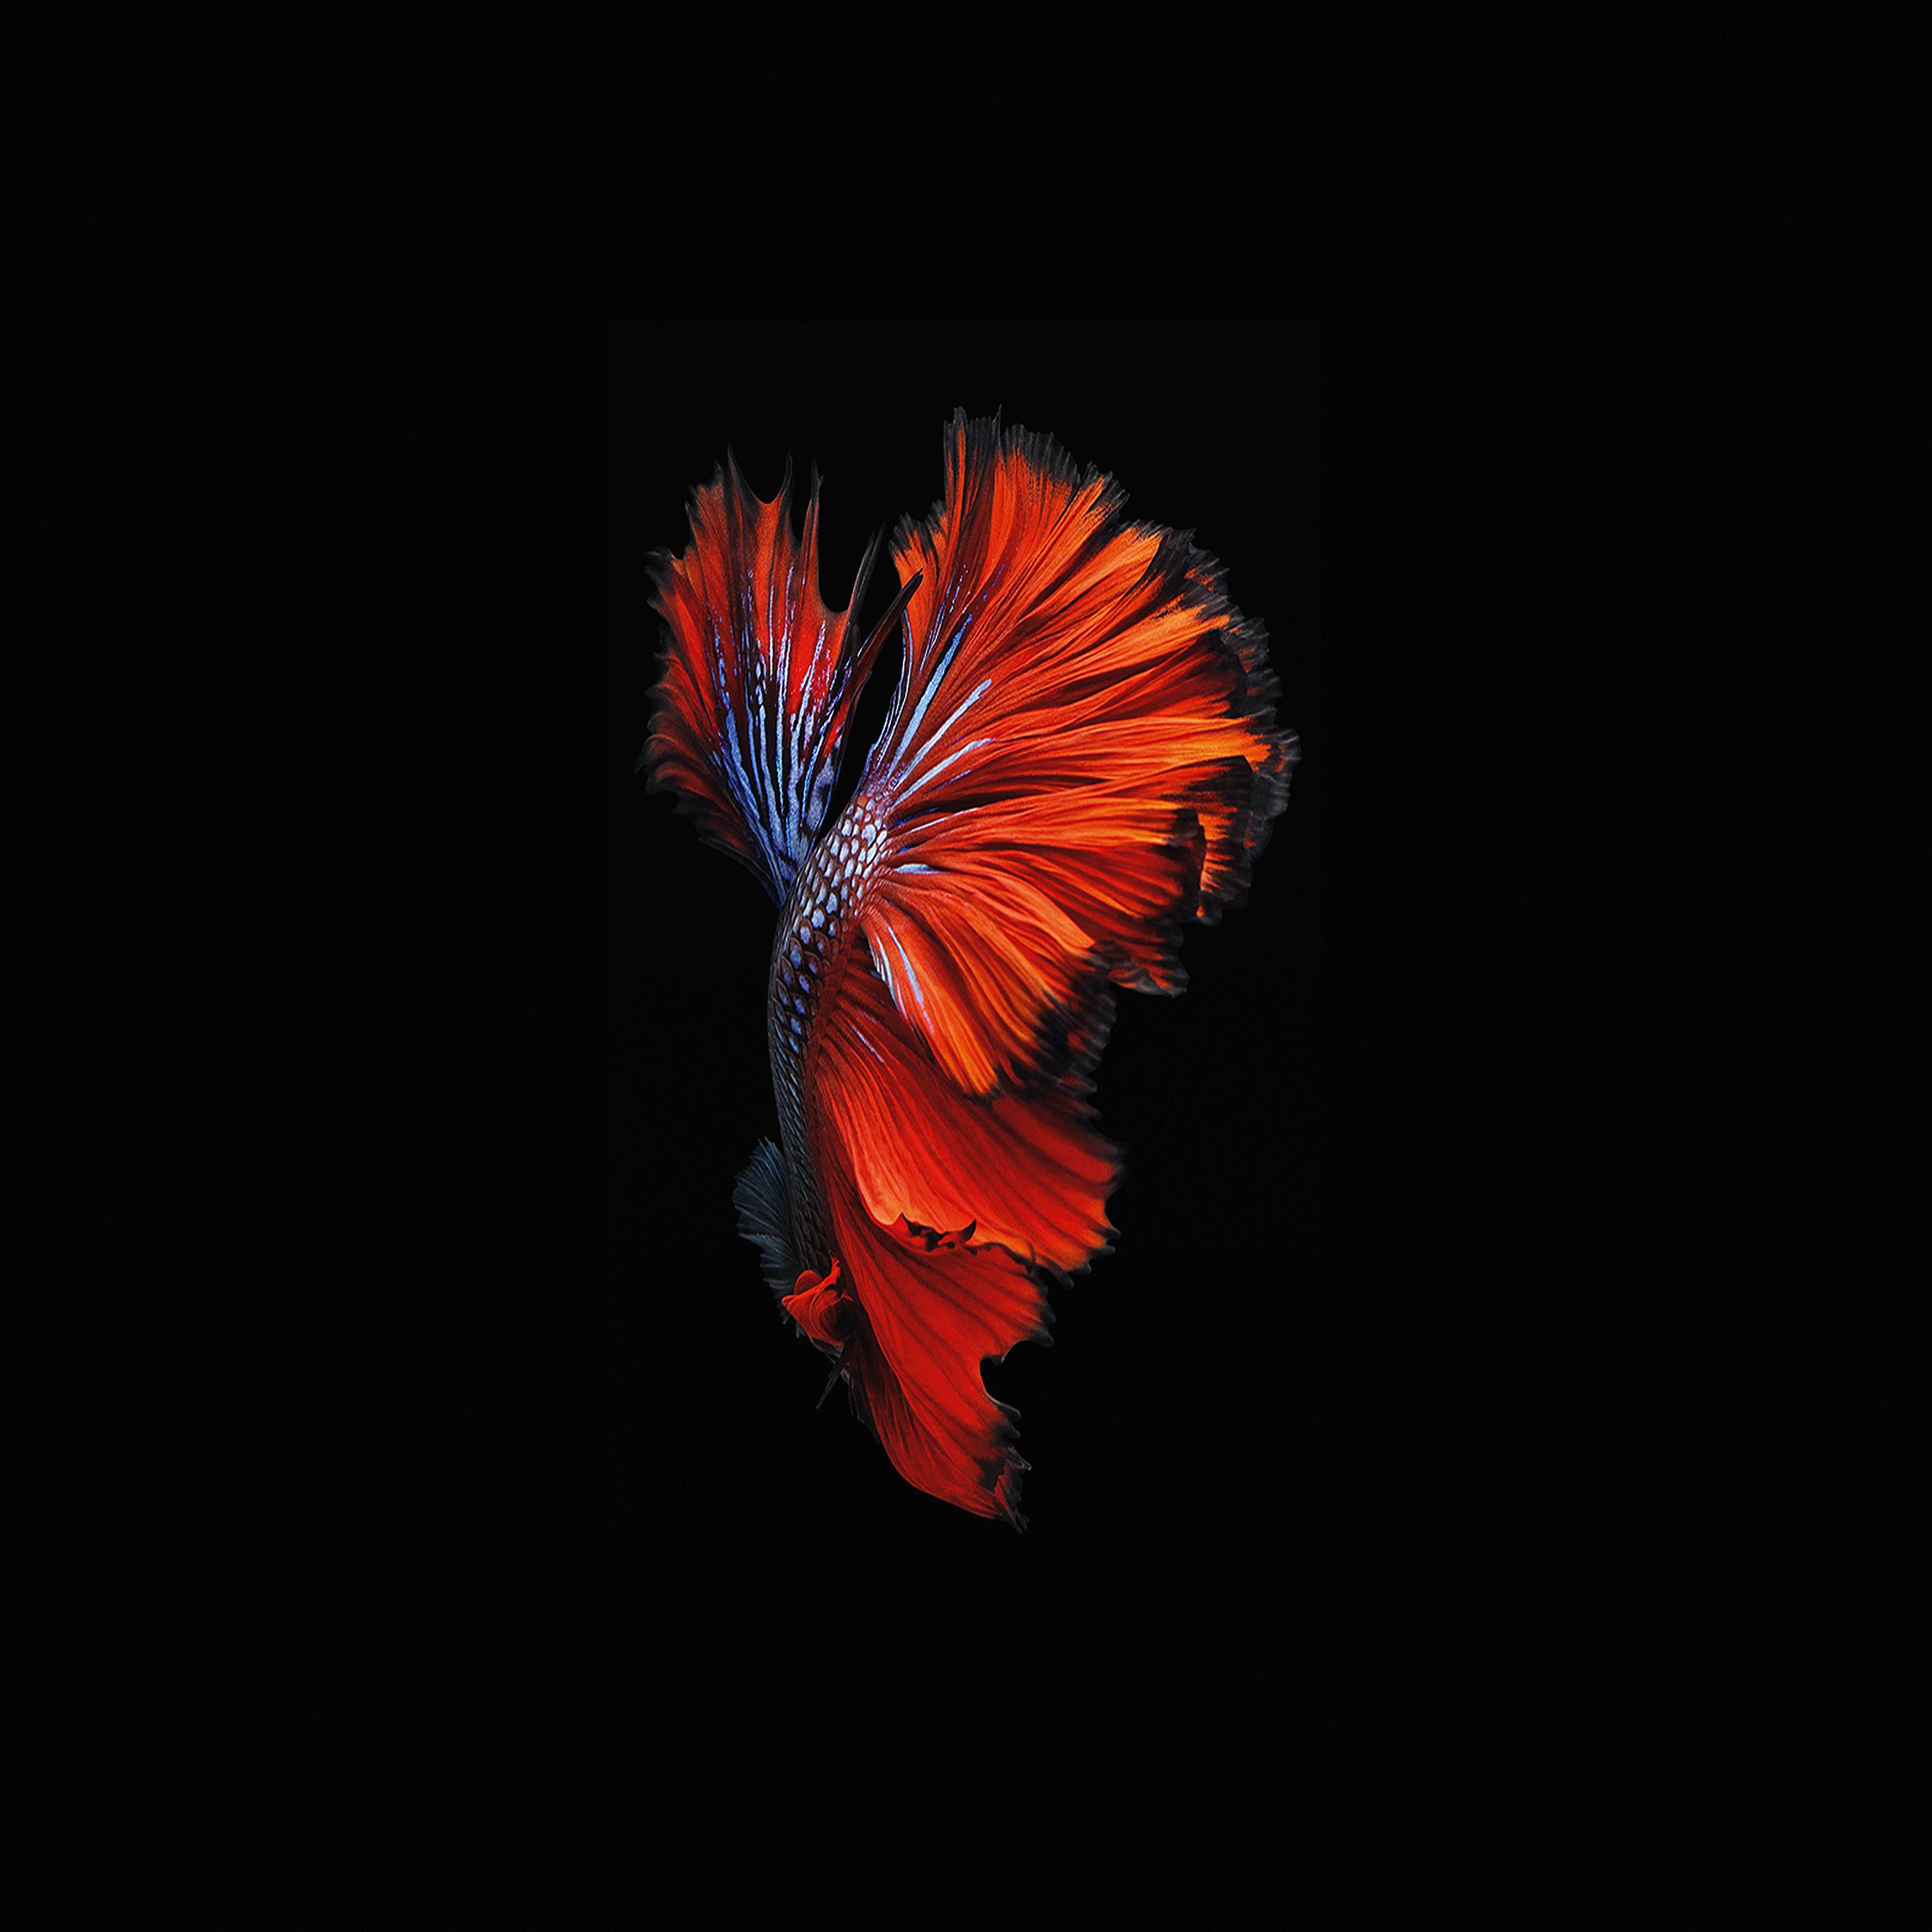 an81 apple ios9 fish live background dark red. Black Bedroom Furniture Sets. Home Design Ideas